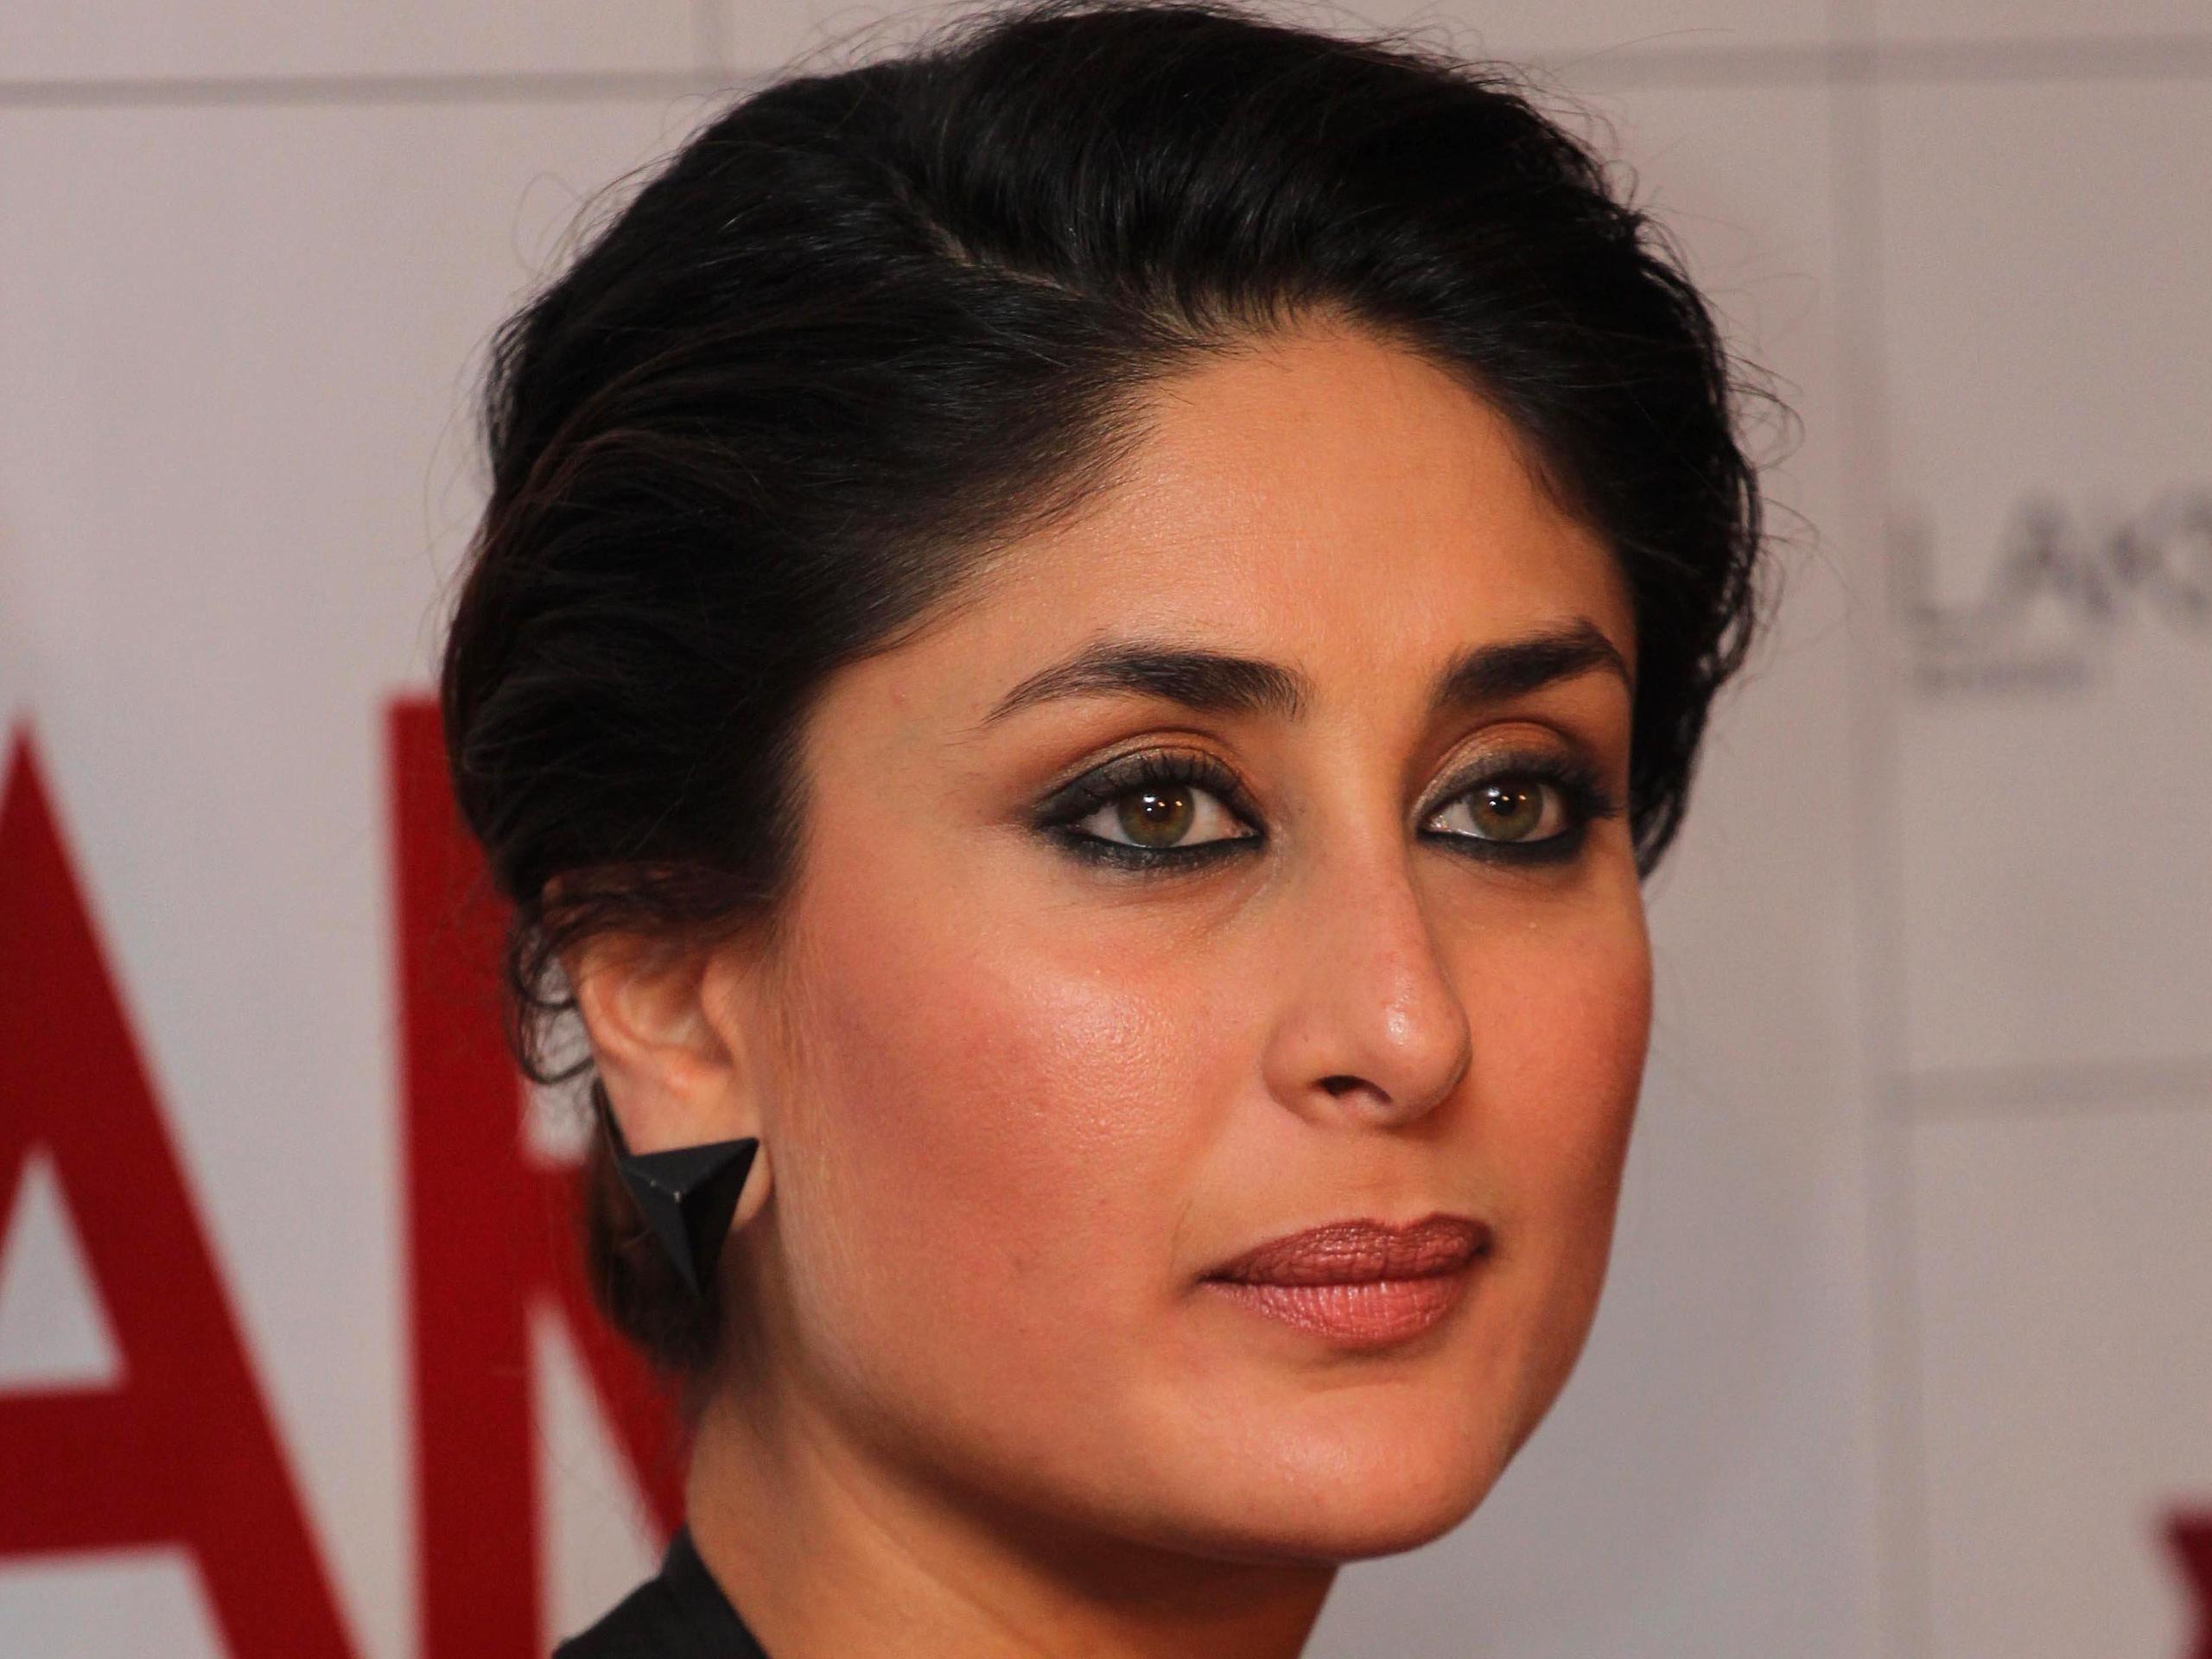 KareenaKapoor have #AttractiveEyes.  Attractive eyes, Beauty